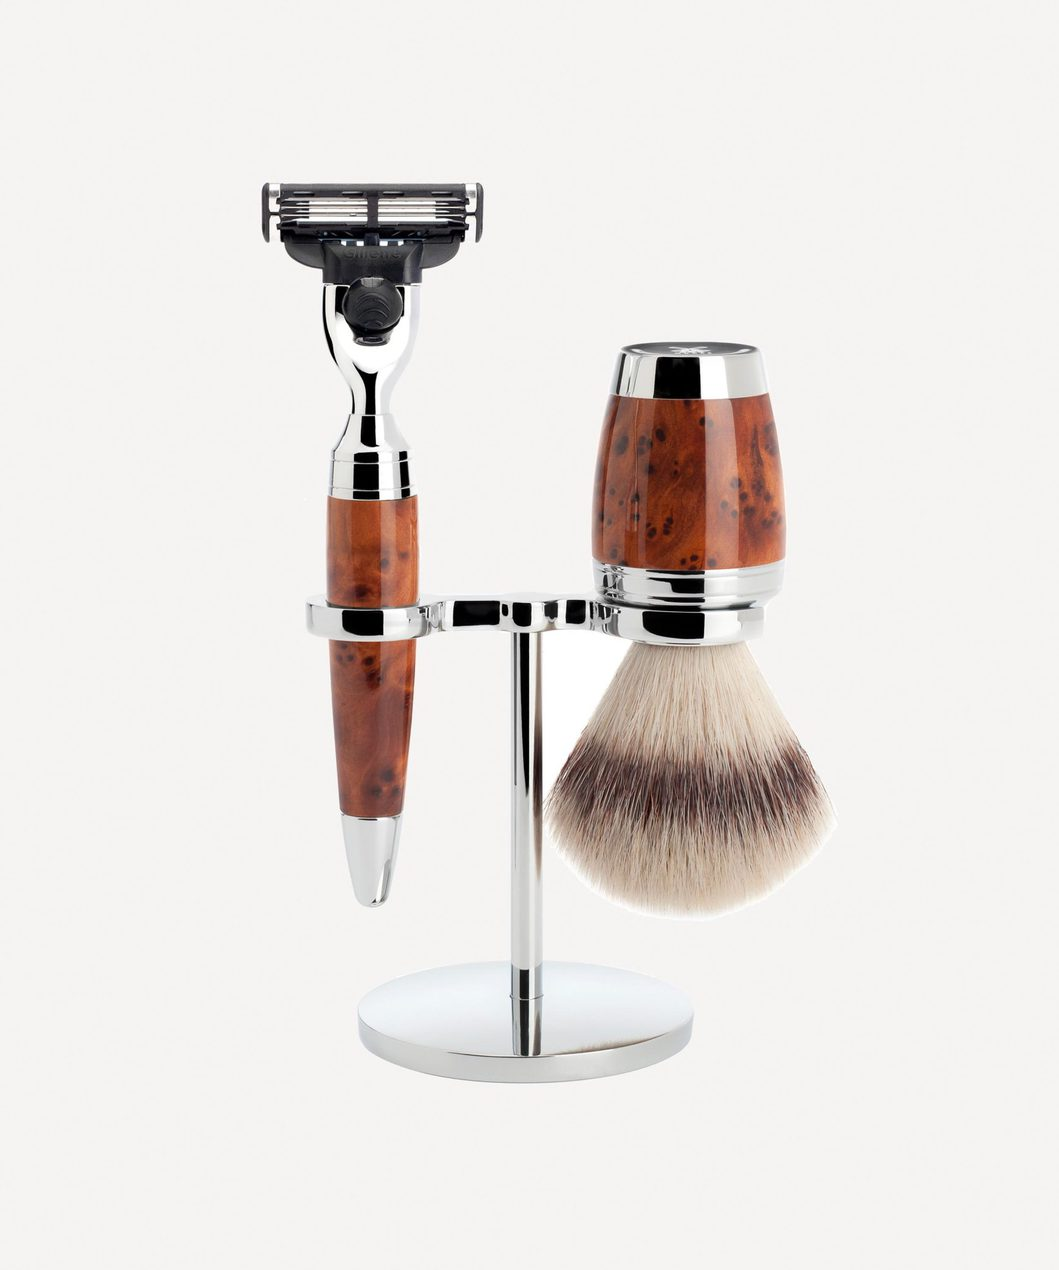 Mule shaving set for mens grooming